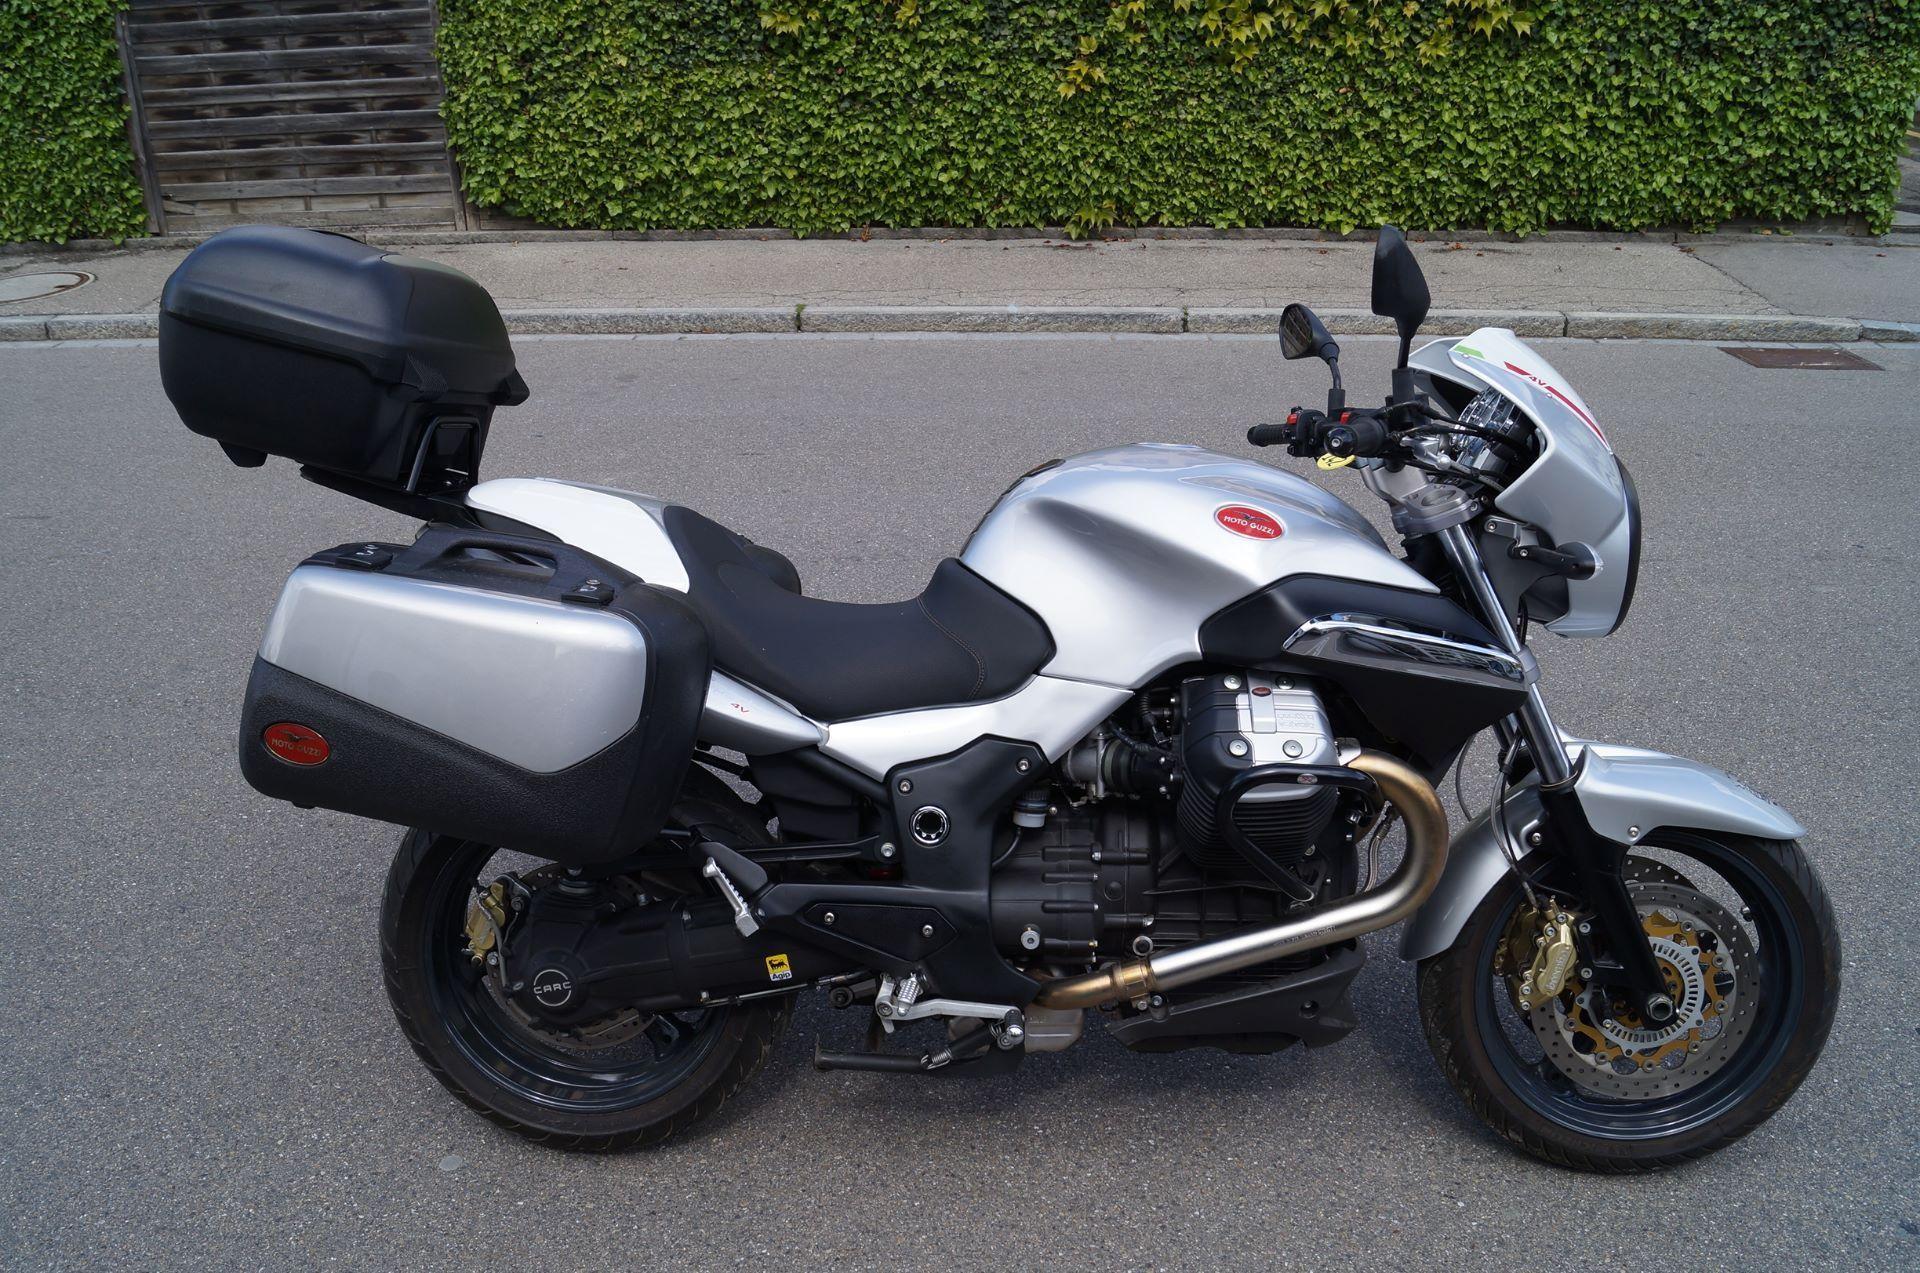 moto occasions acheter moto guzzi sport 1200 4v abs scherrer motos ag steckborn. Black Bedroom Furniture Sets. Home Design Ideas